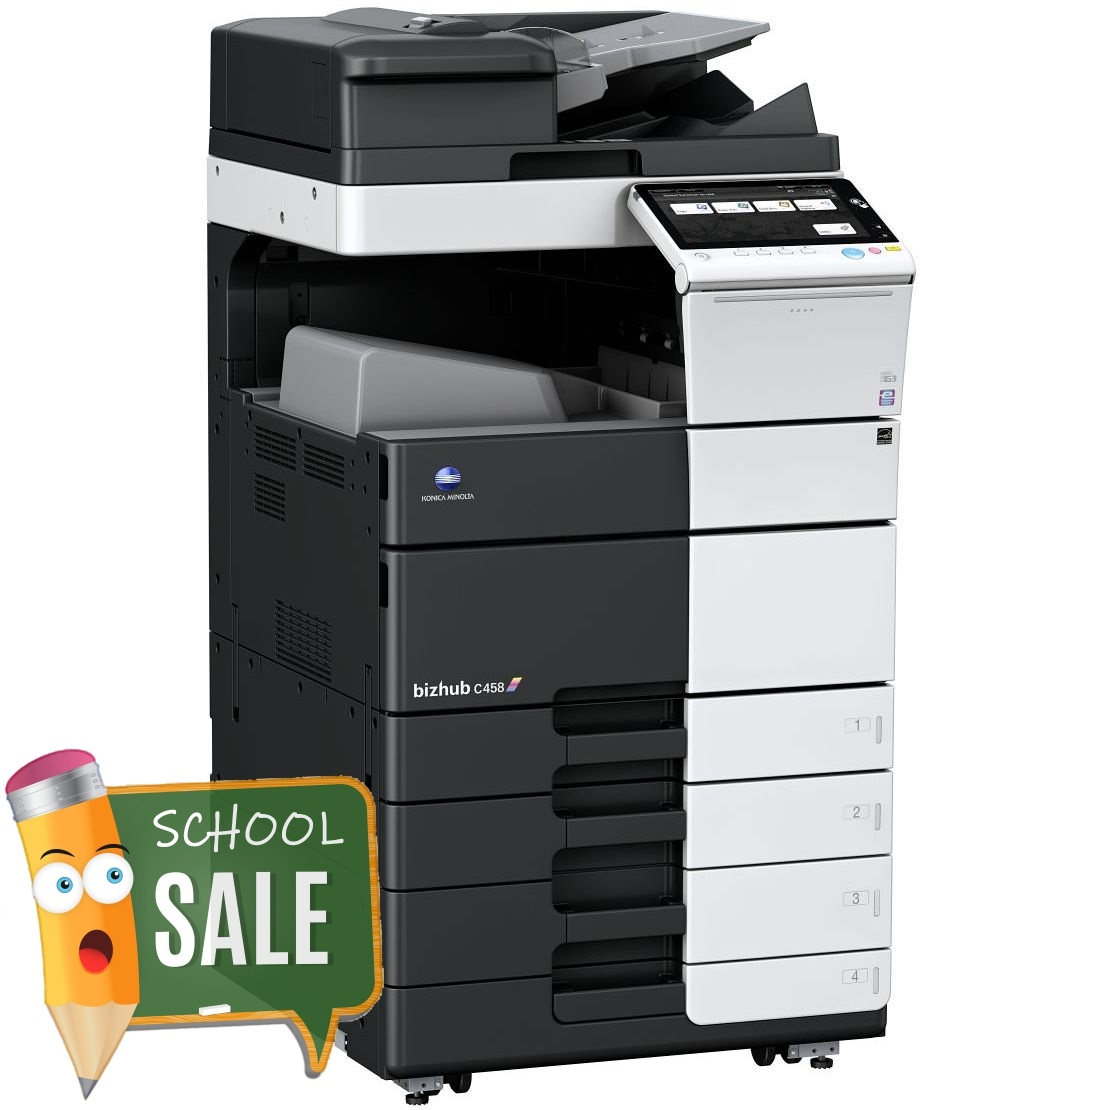 Konica Minolta Bizhub C458 OT-506 PC-215 Colour Copier Printer Rental Price Offers